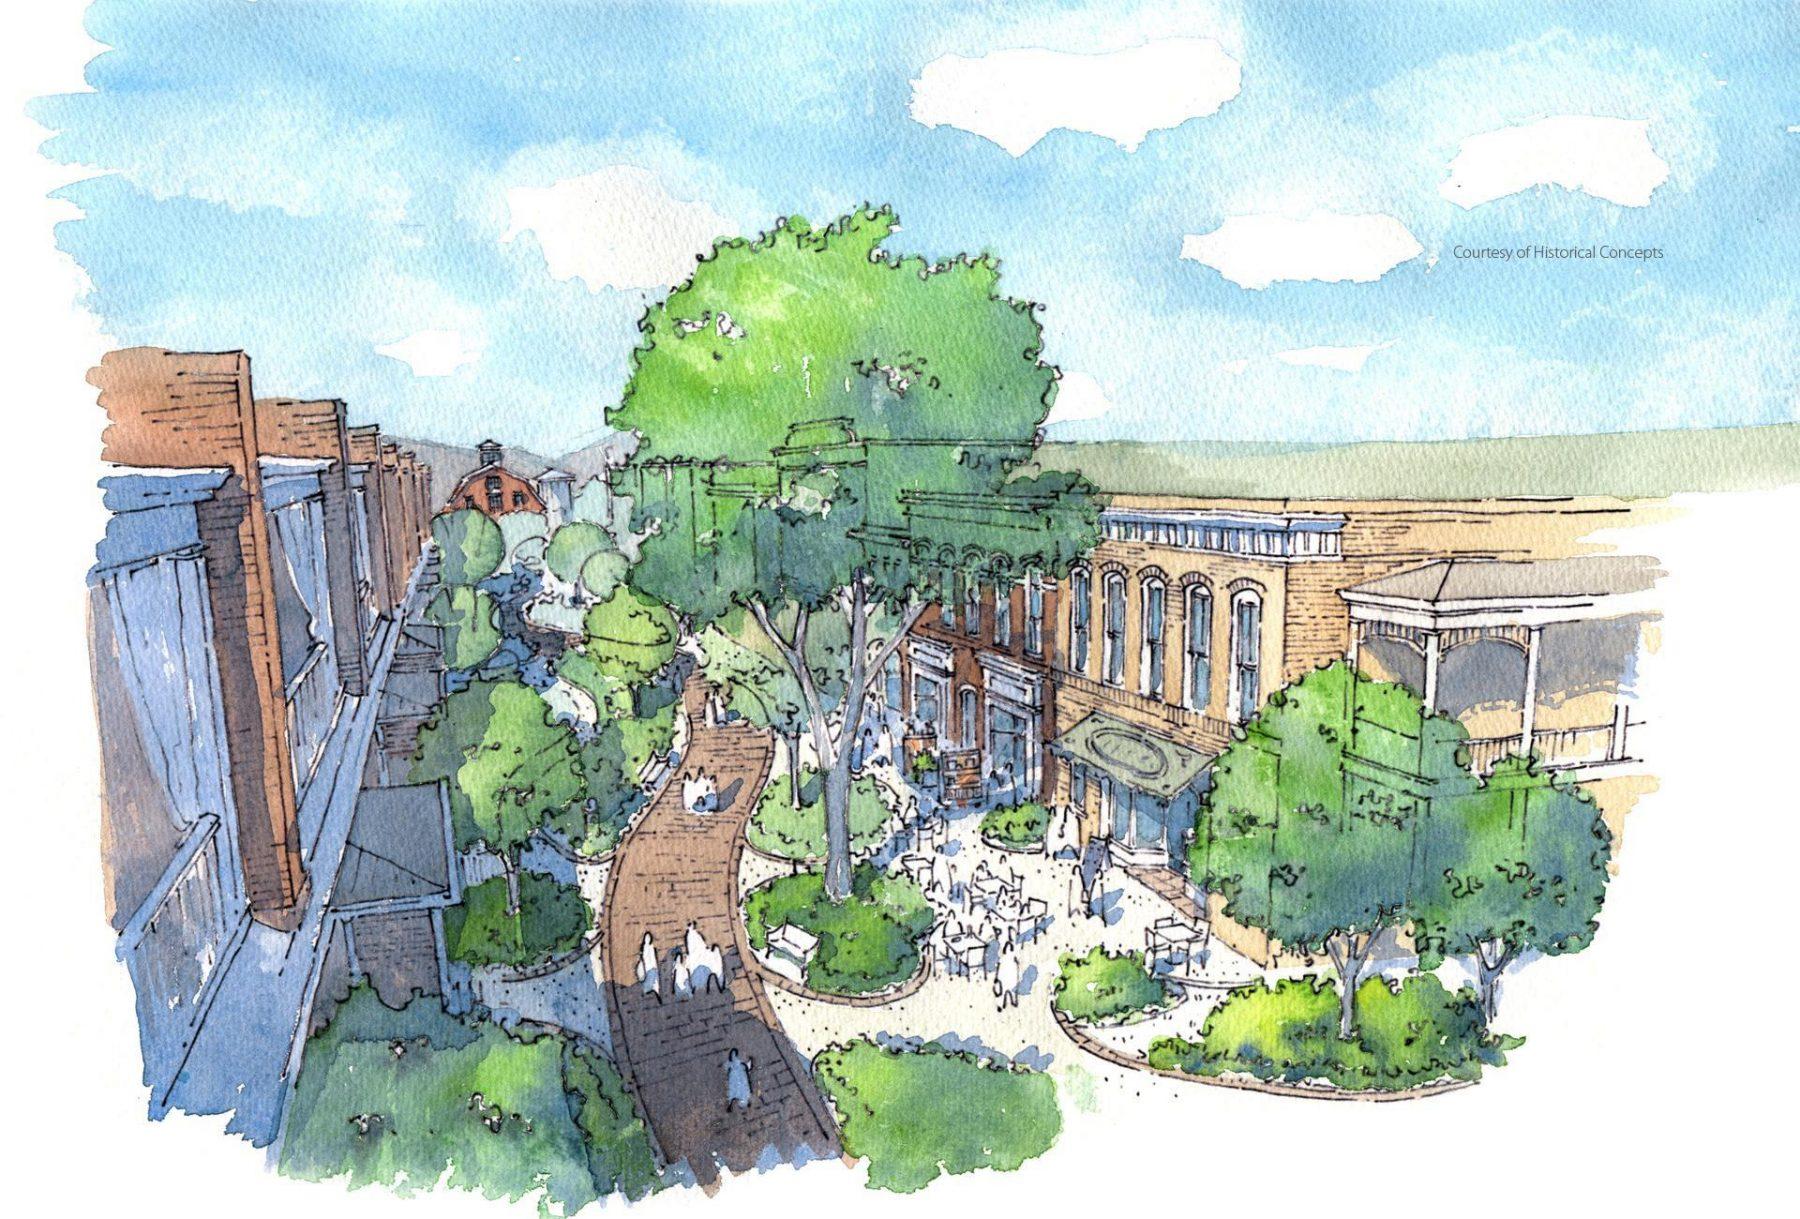 Wolcott Planned Community Landscape Architecture